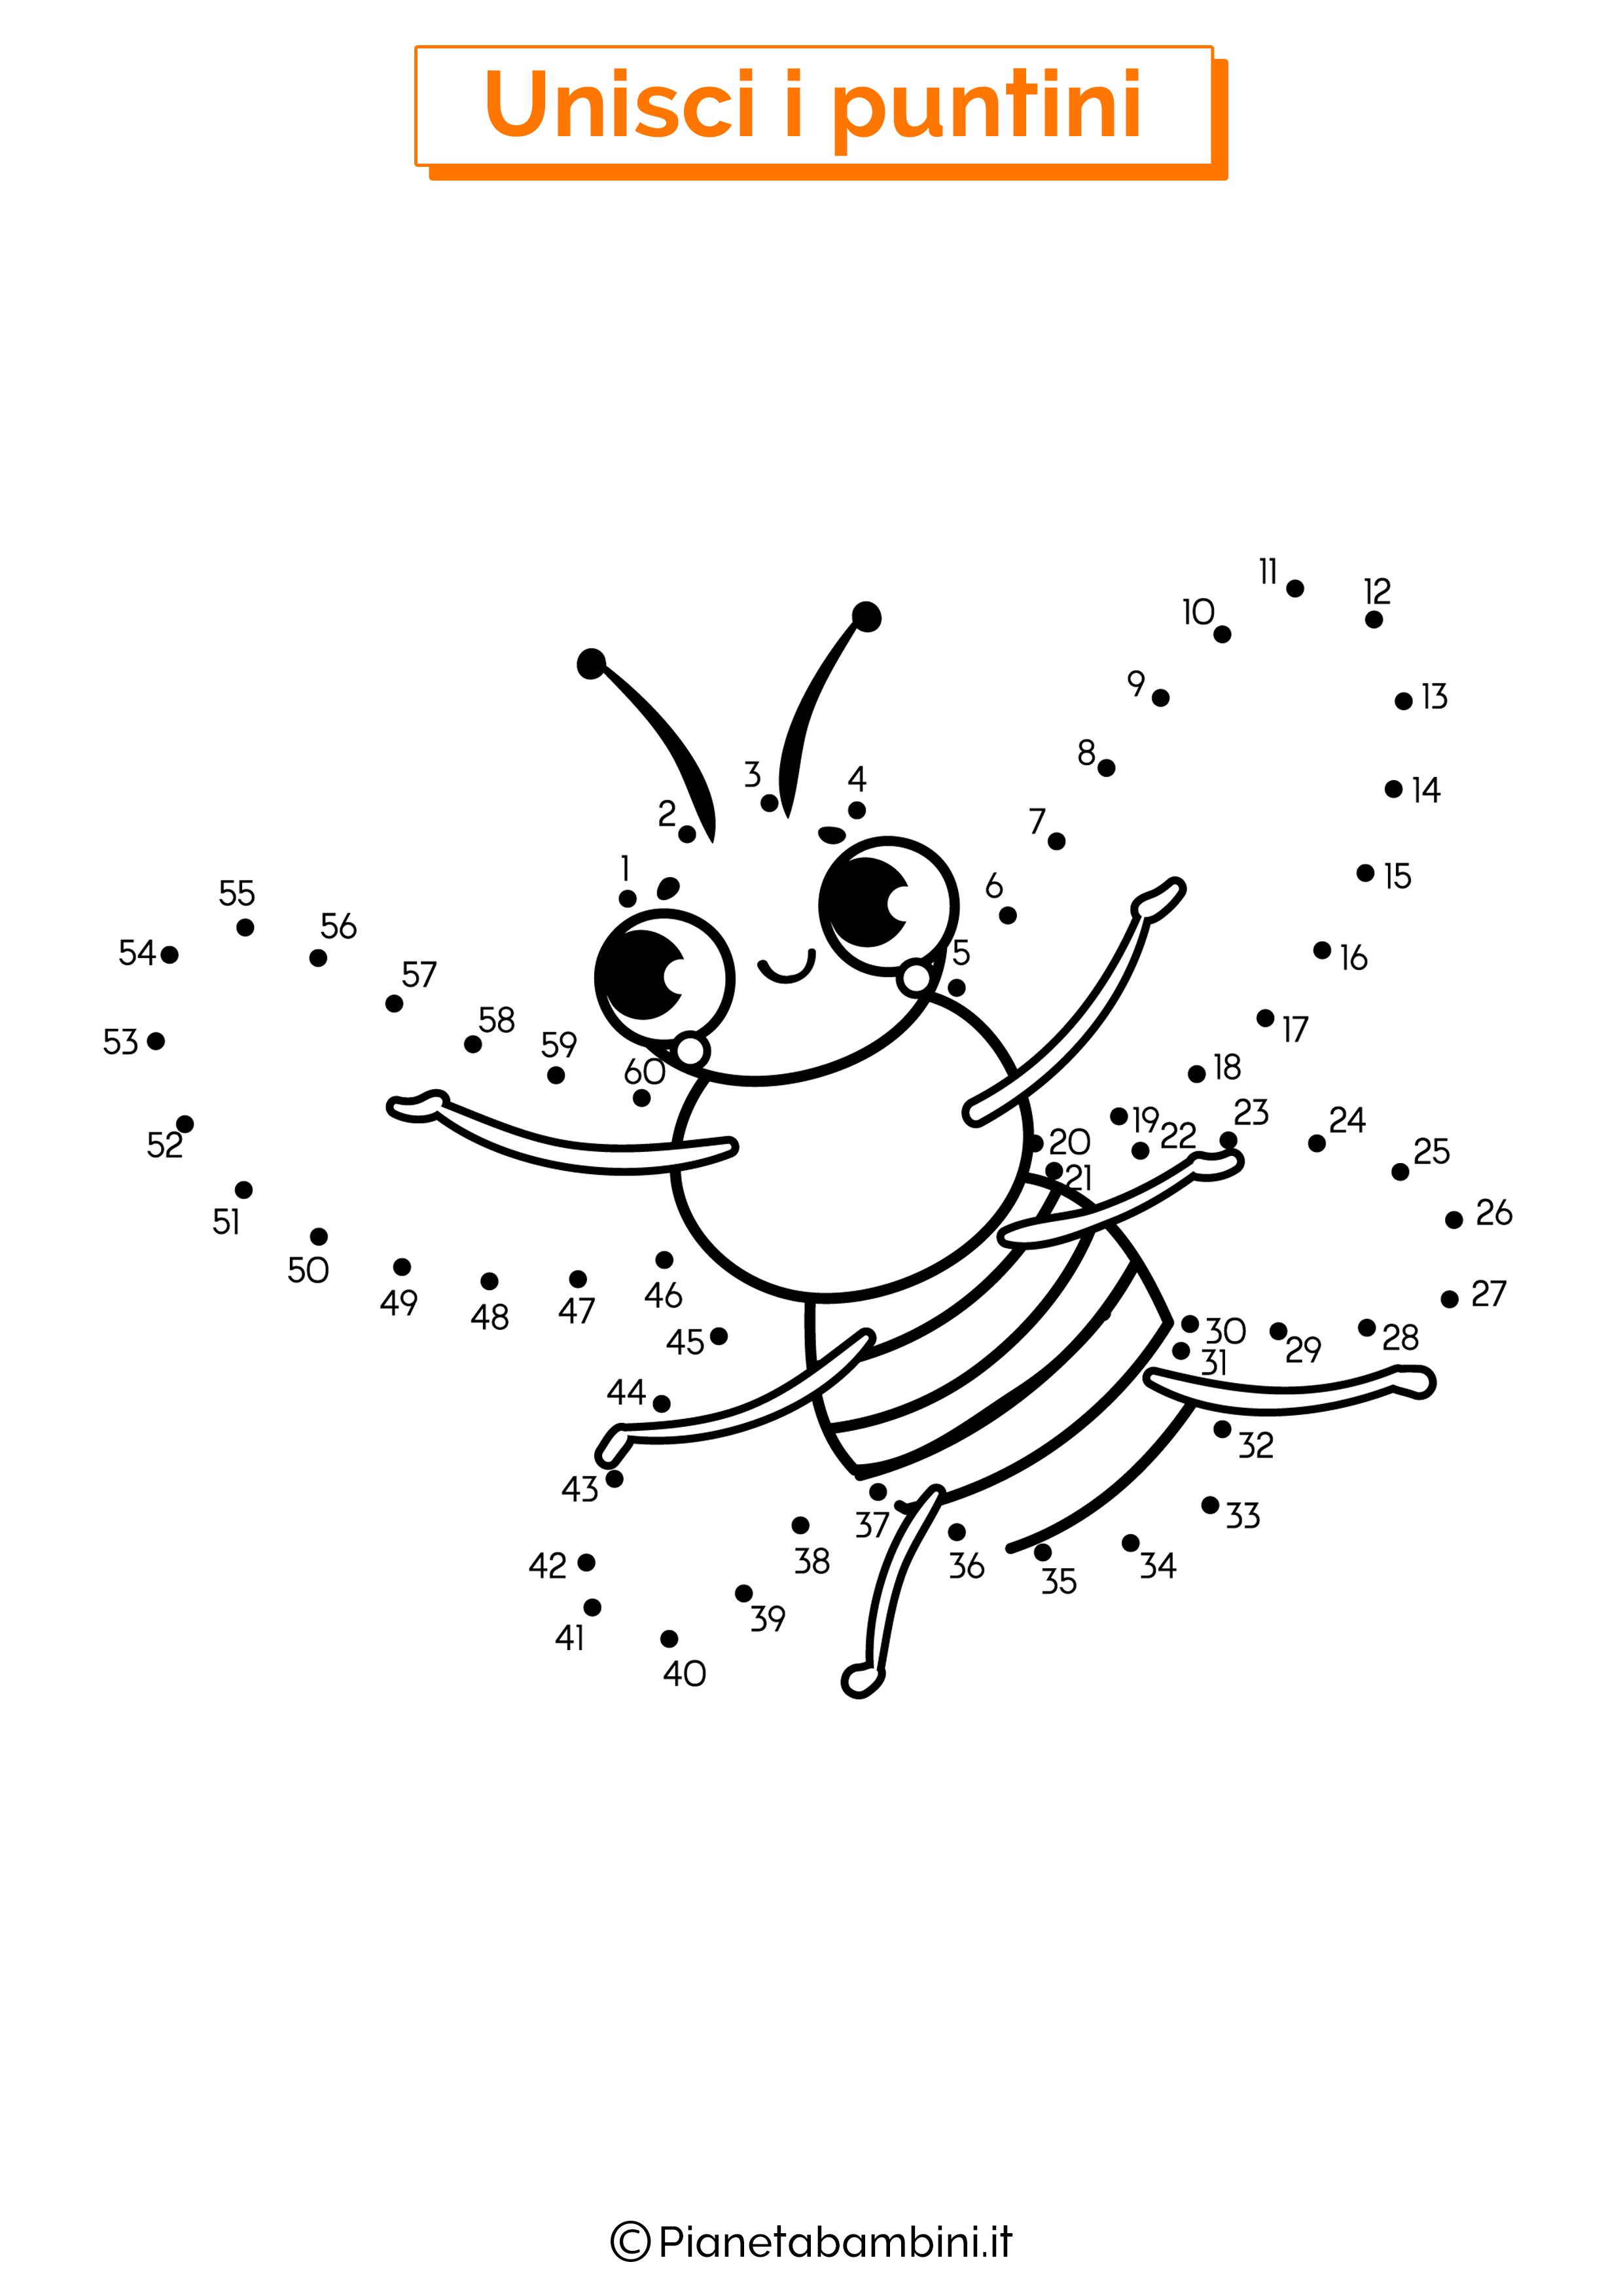 Disegno unisci i puntini da 1 a 50 ape